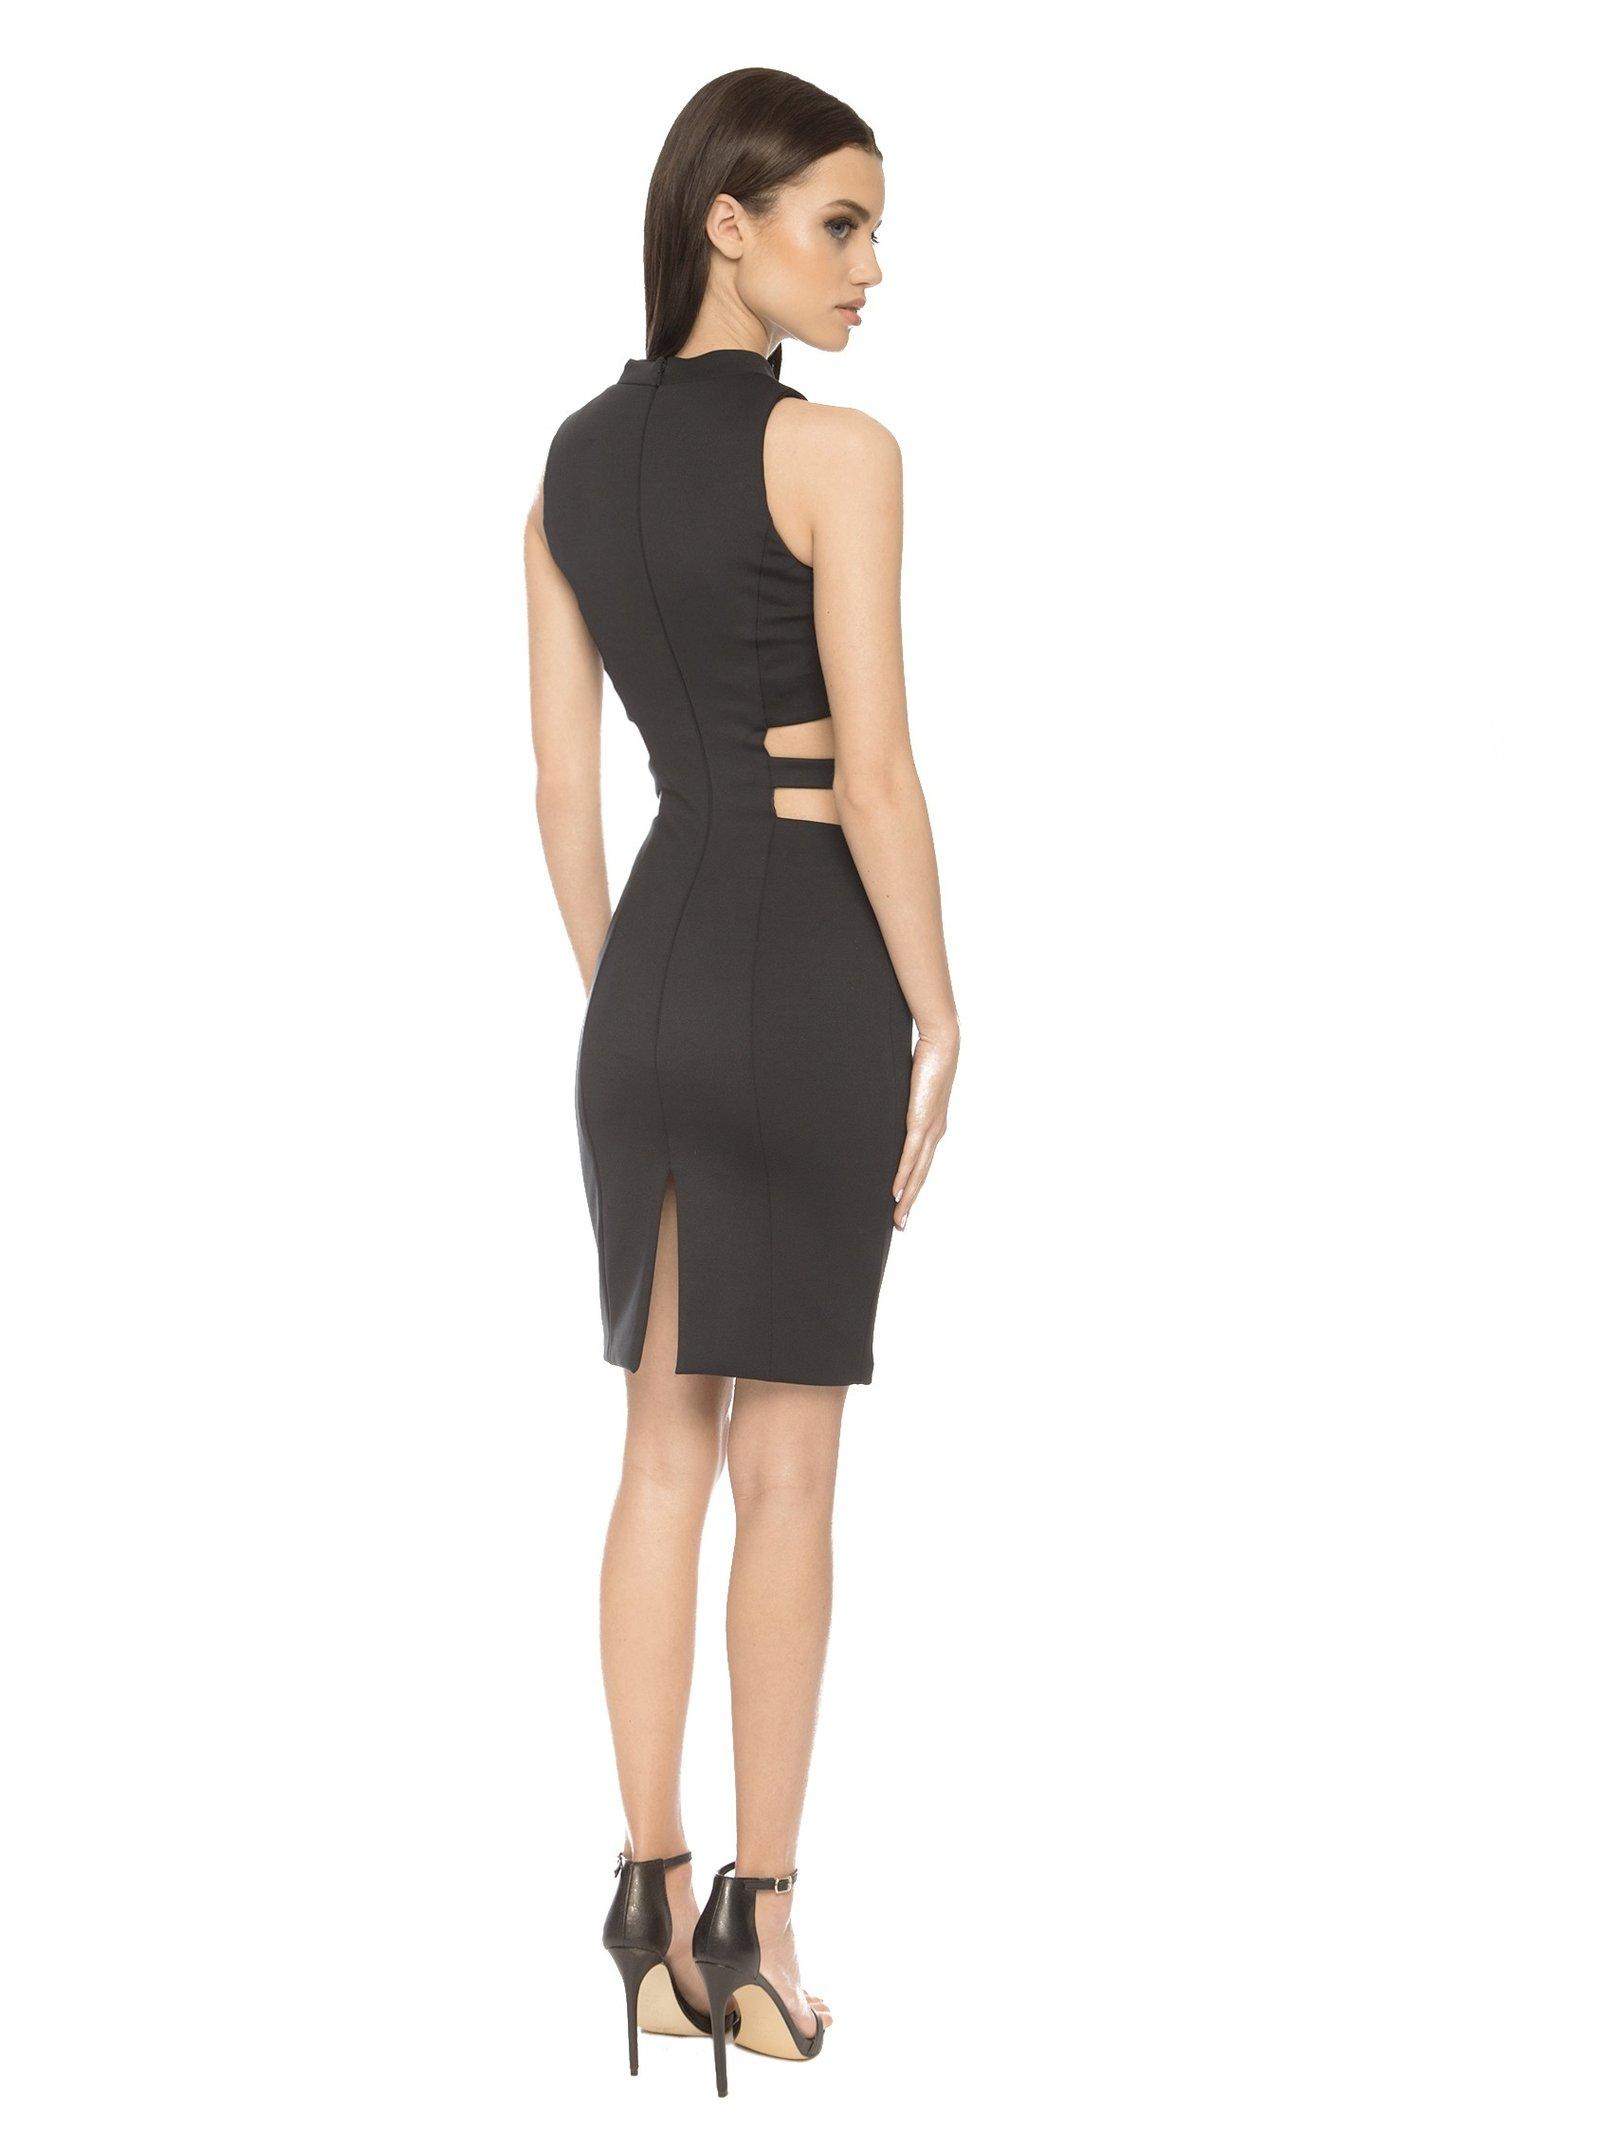 Aloura London Kendal Dress - Black